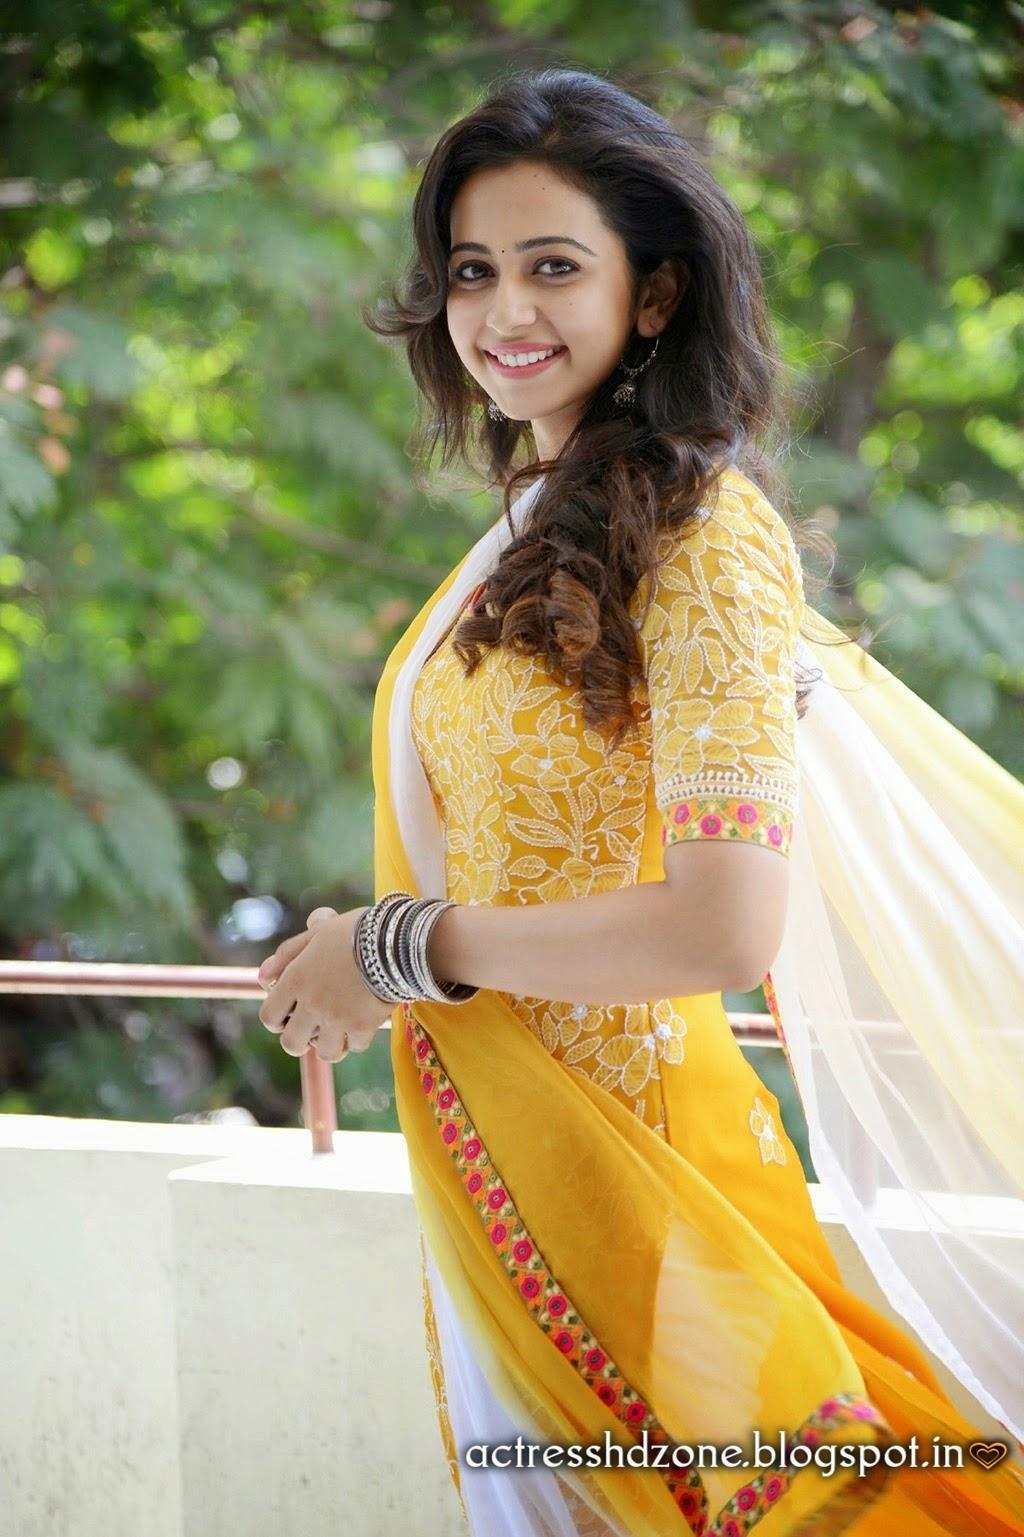 South Indian Actress Wallpapers In Hd Rakul Preet Sing Full Hd Wallpapers In Yellow Dress-1001